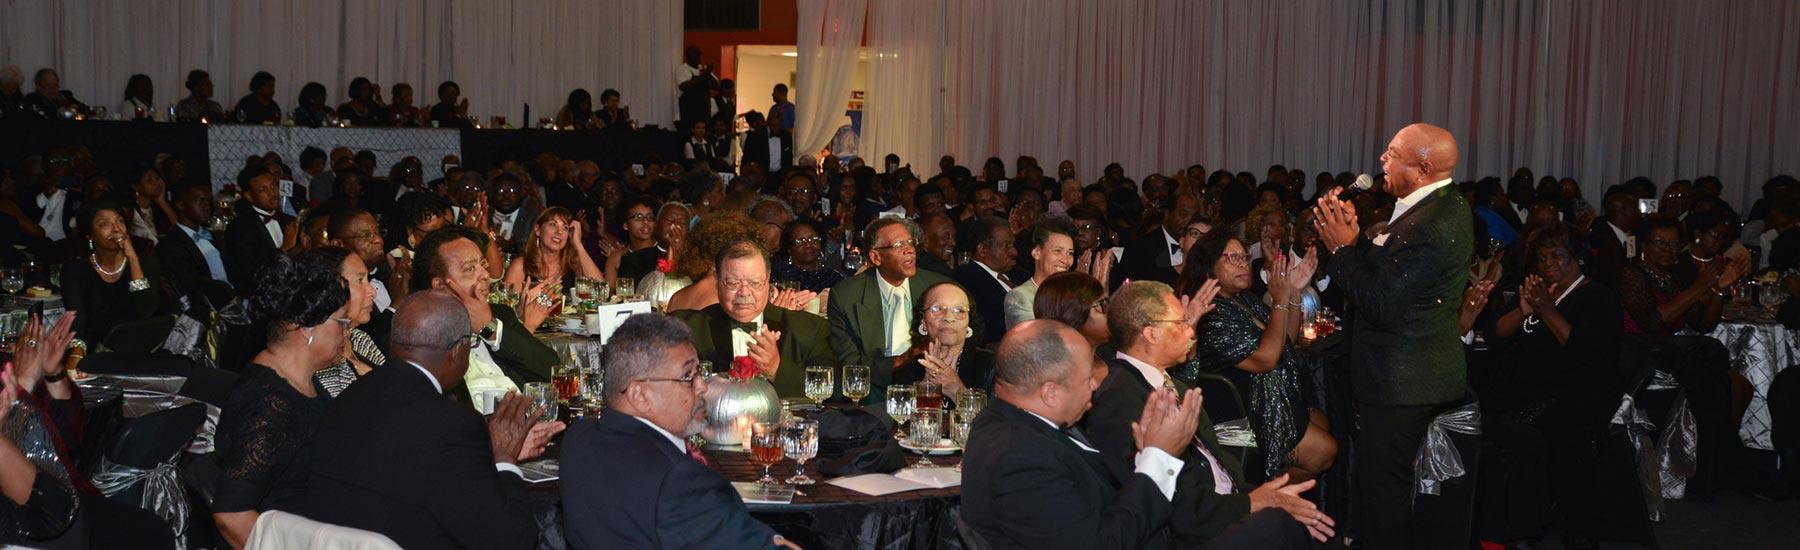 Presidential Scholarship Gala